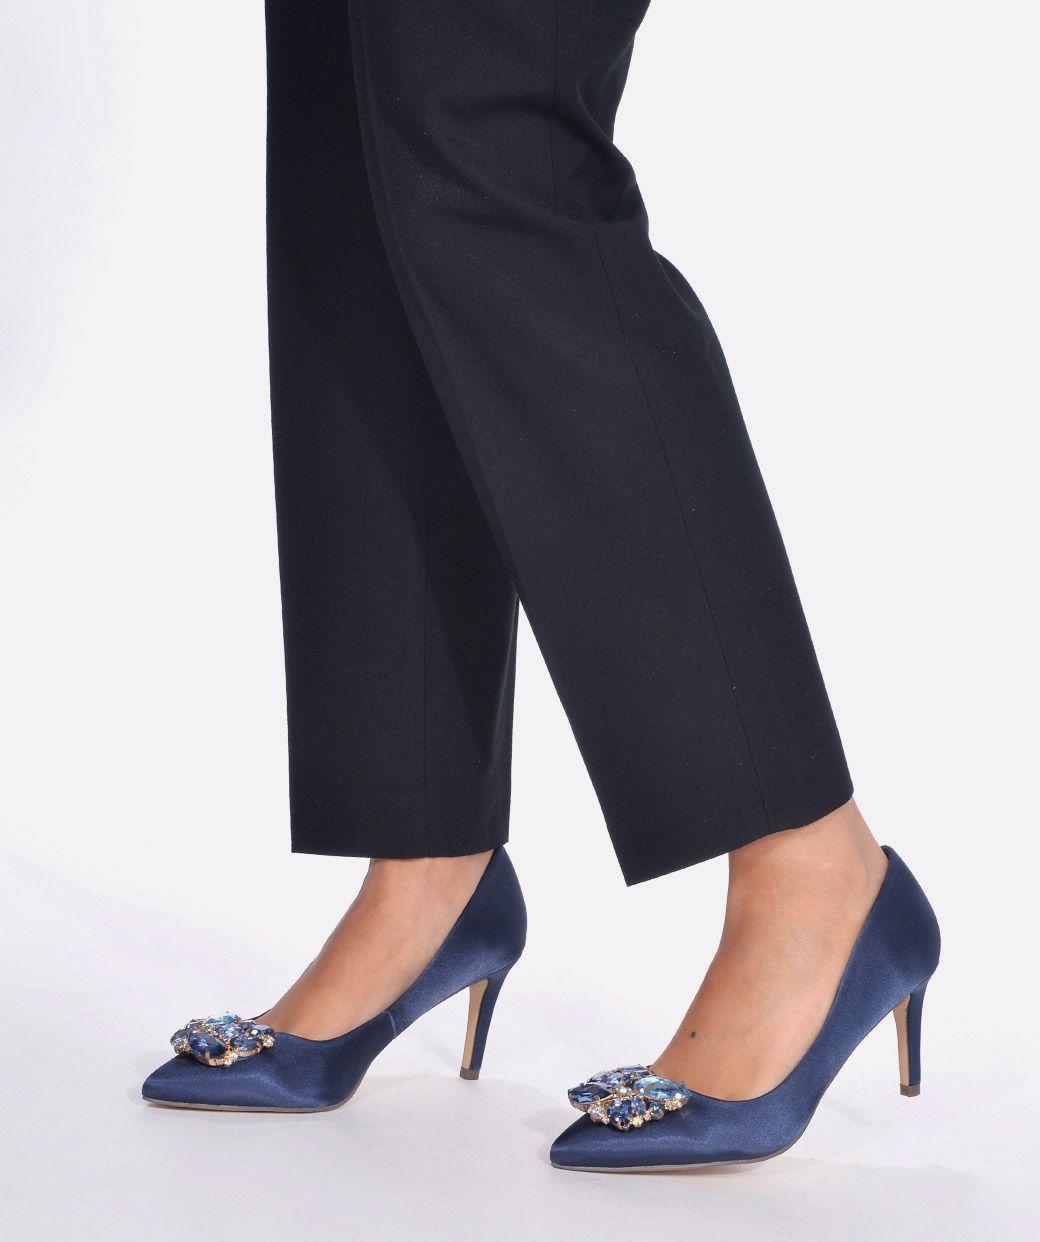 mejor amado b586f d5a54 zapatos marypaz mujer, zapatos marypaz 2019, zapatos marypaz ...